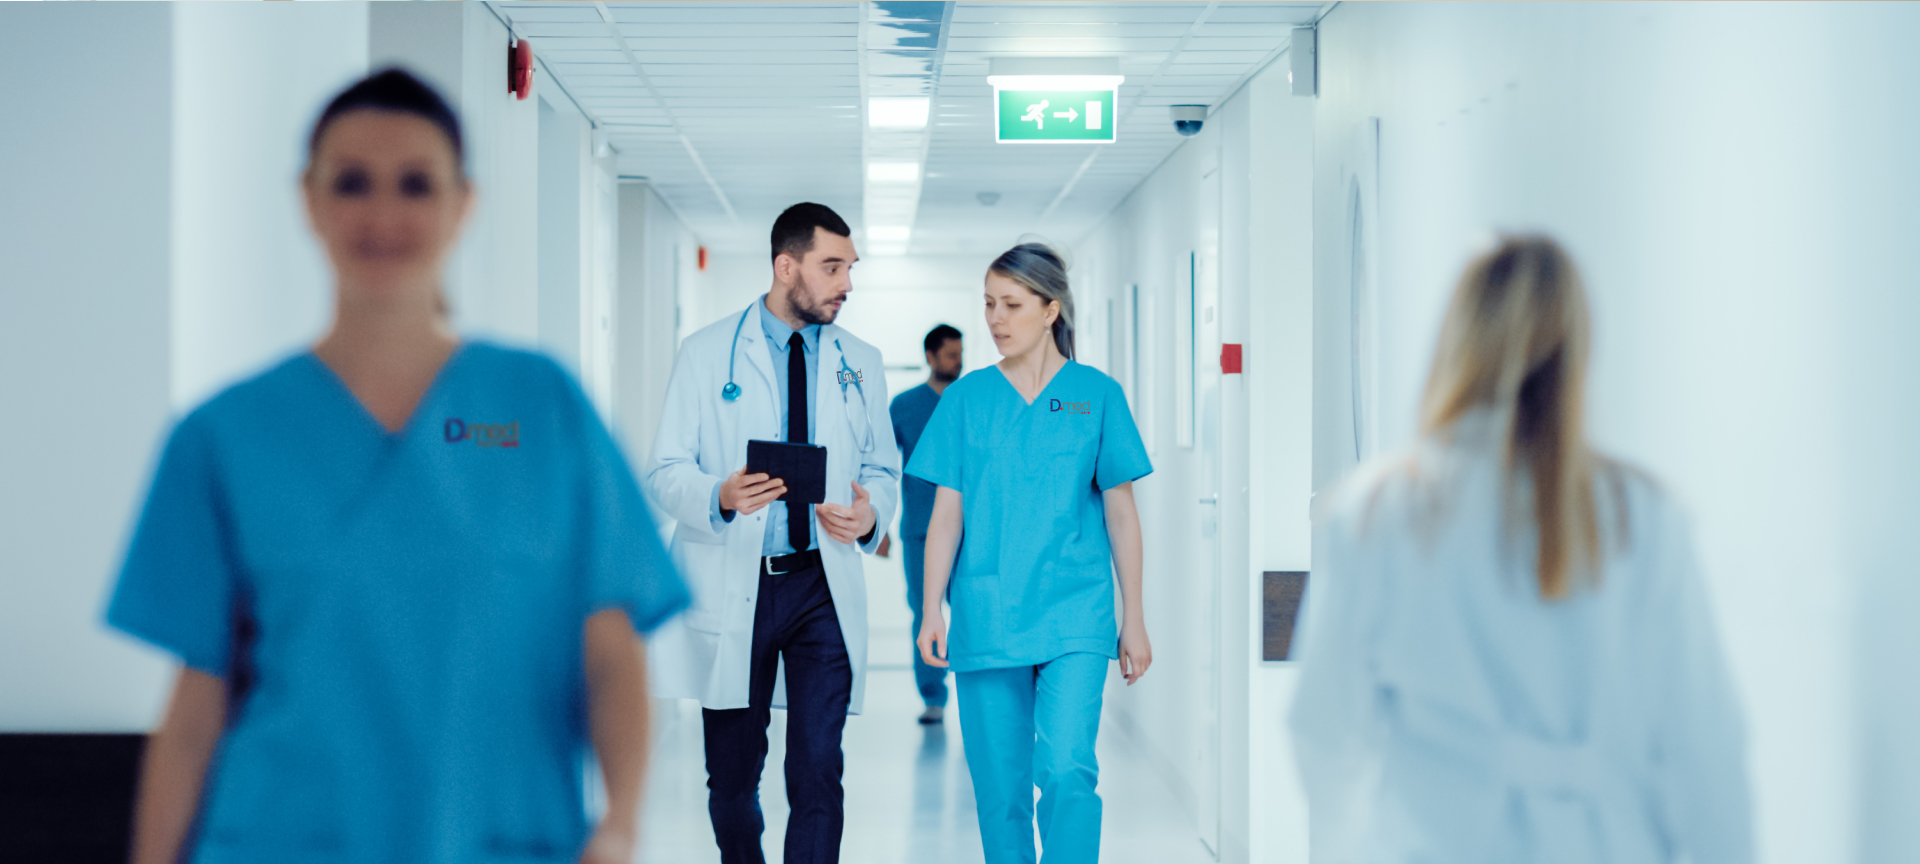 Healthcare staff walking down corridor